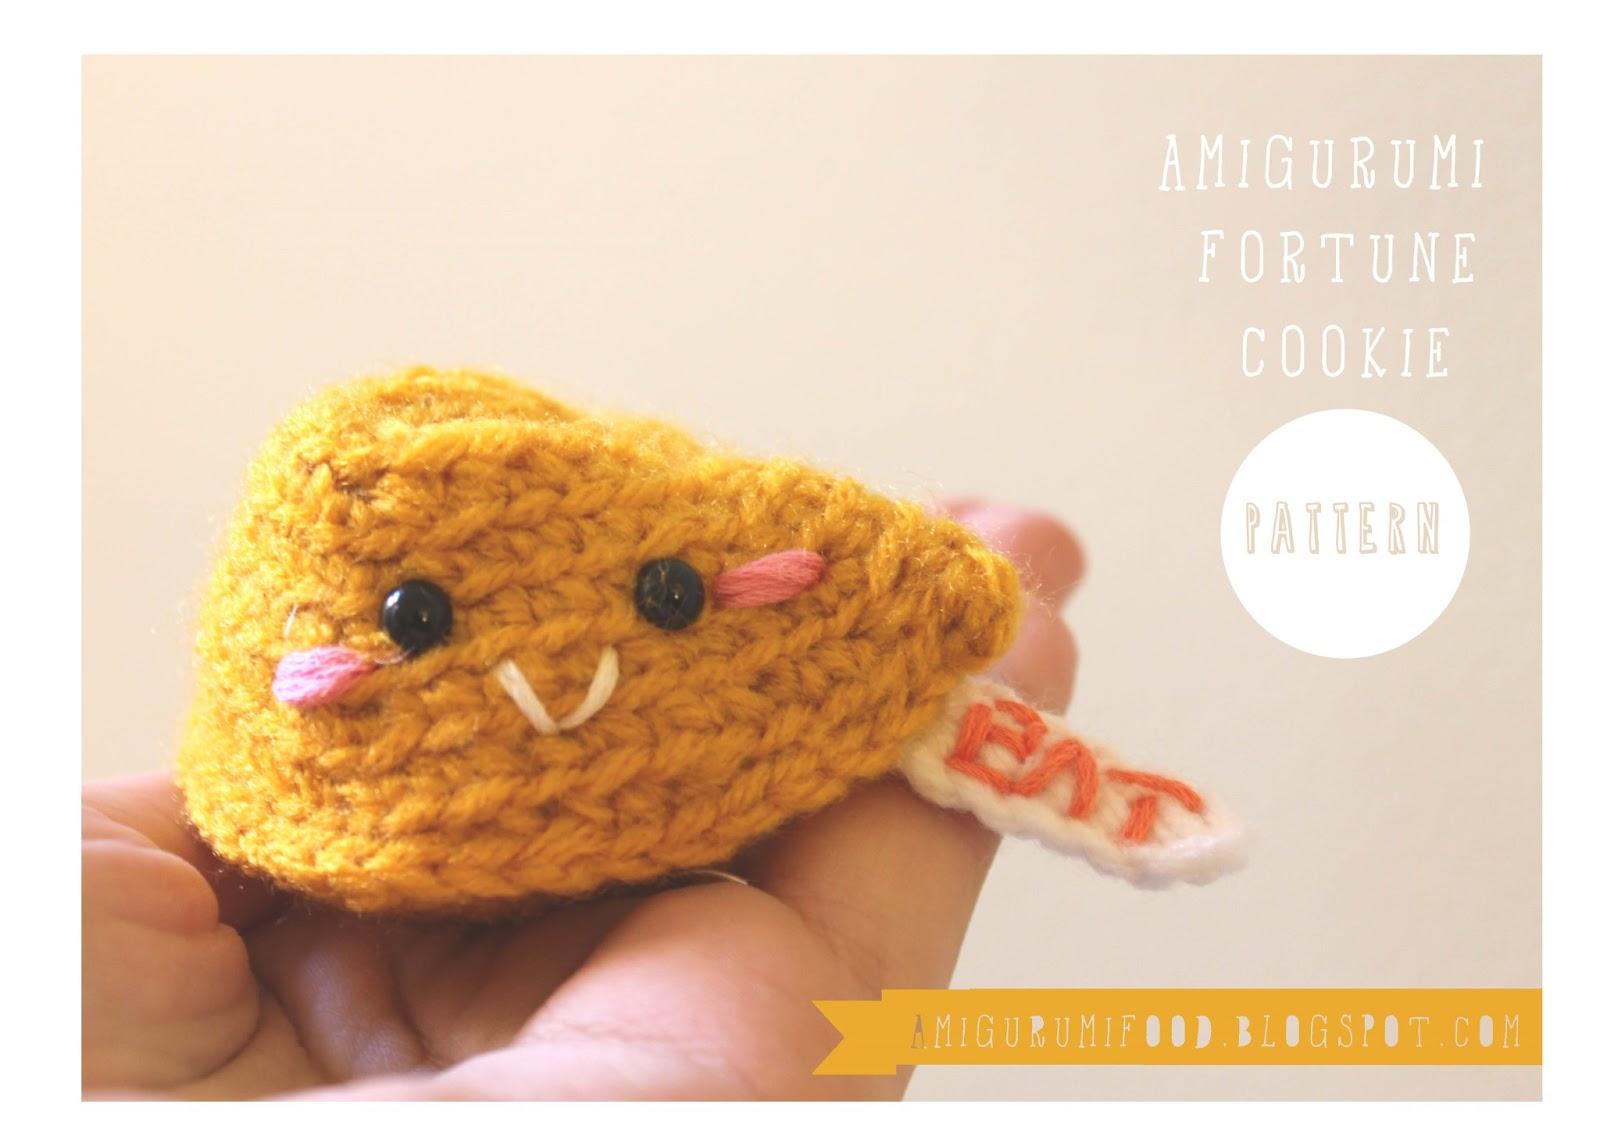 Amigurumi Patterns Free Food : Amigurumi Food: Fortune Cookie Amigurumi